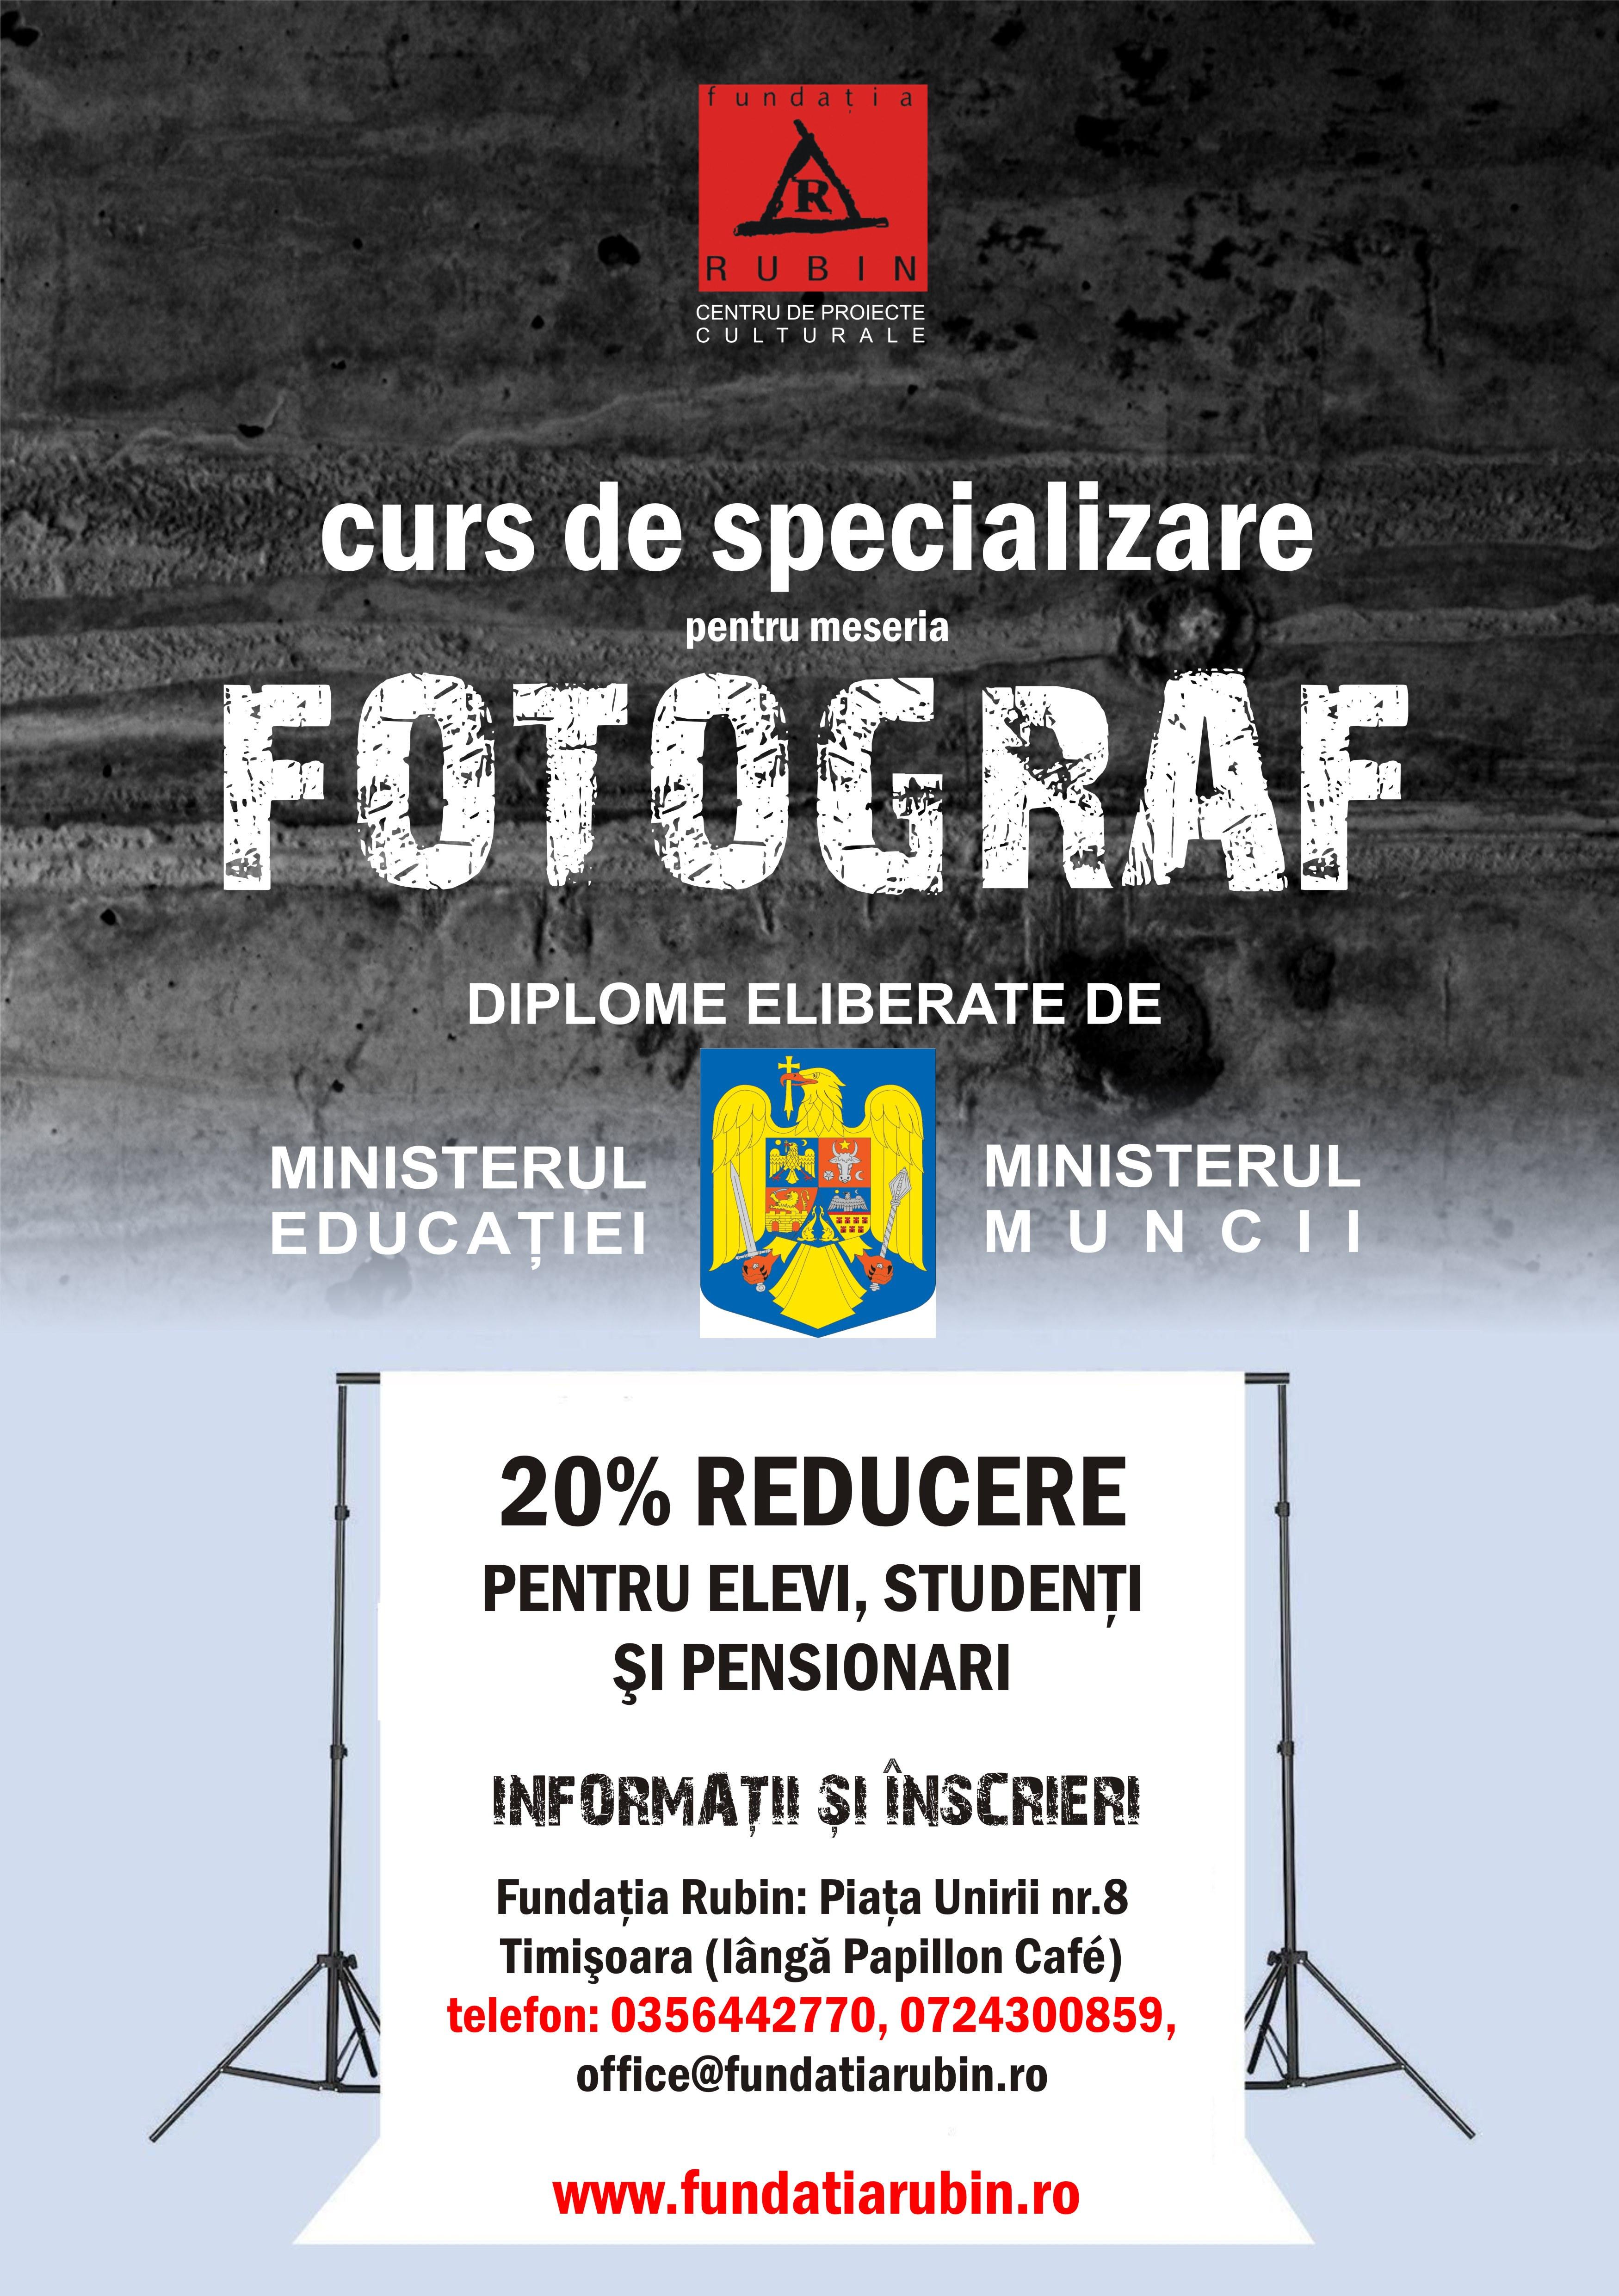 Curs Fotografie Timisoara - Acreditat CNFPA